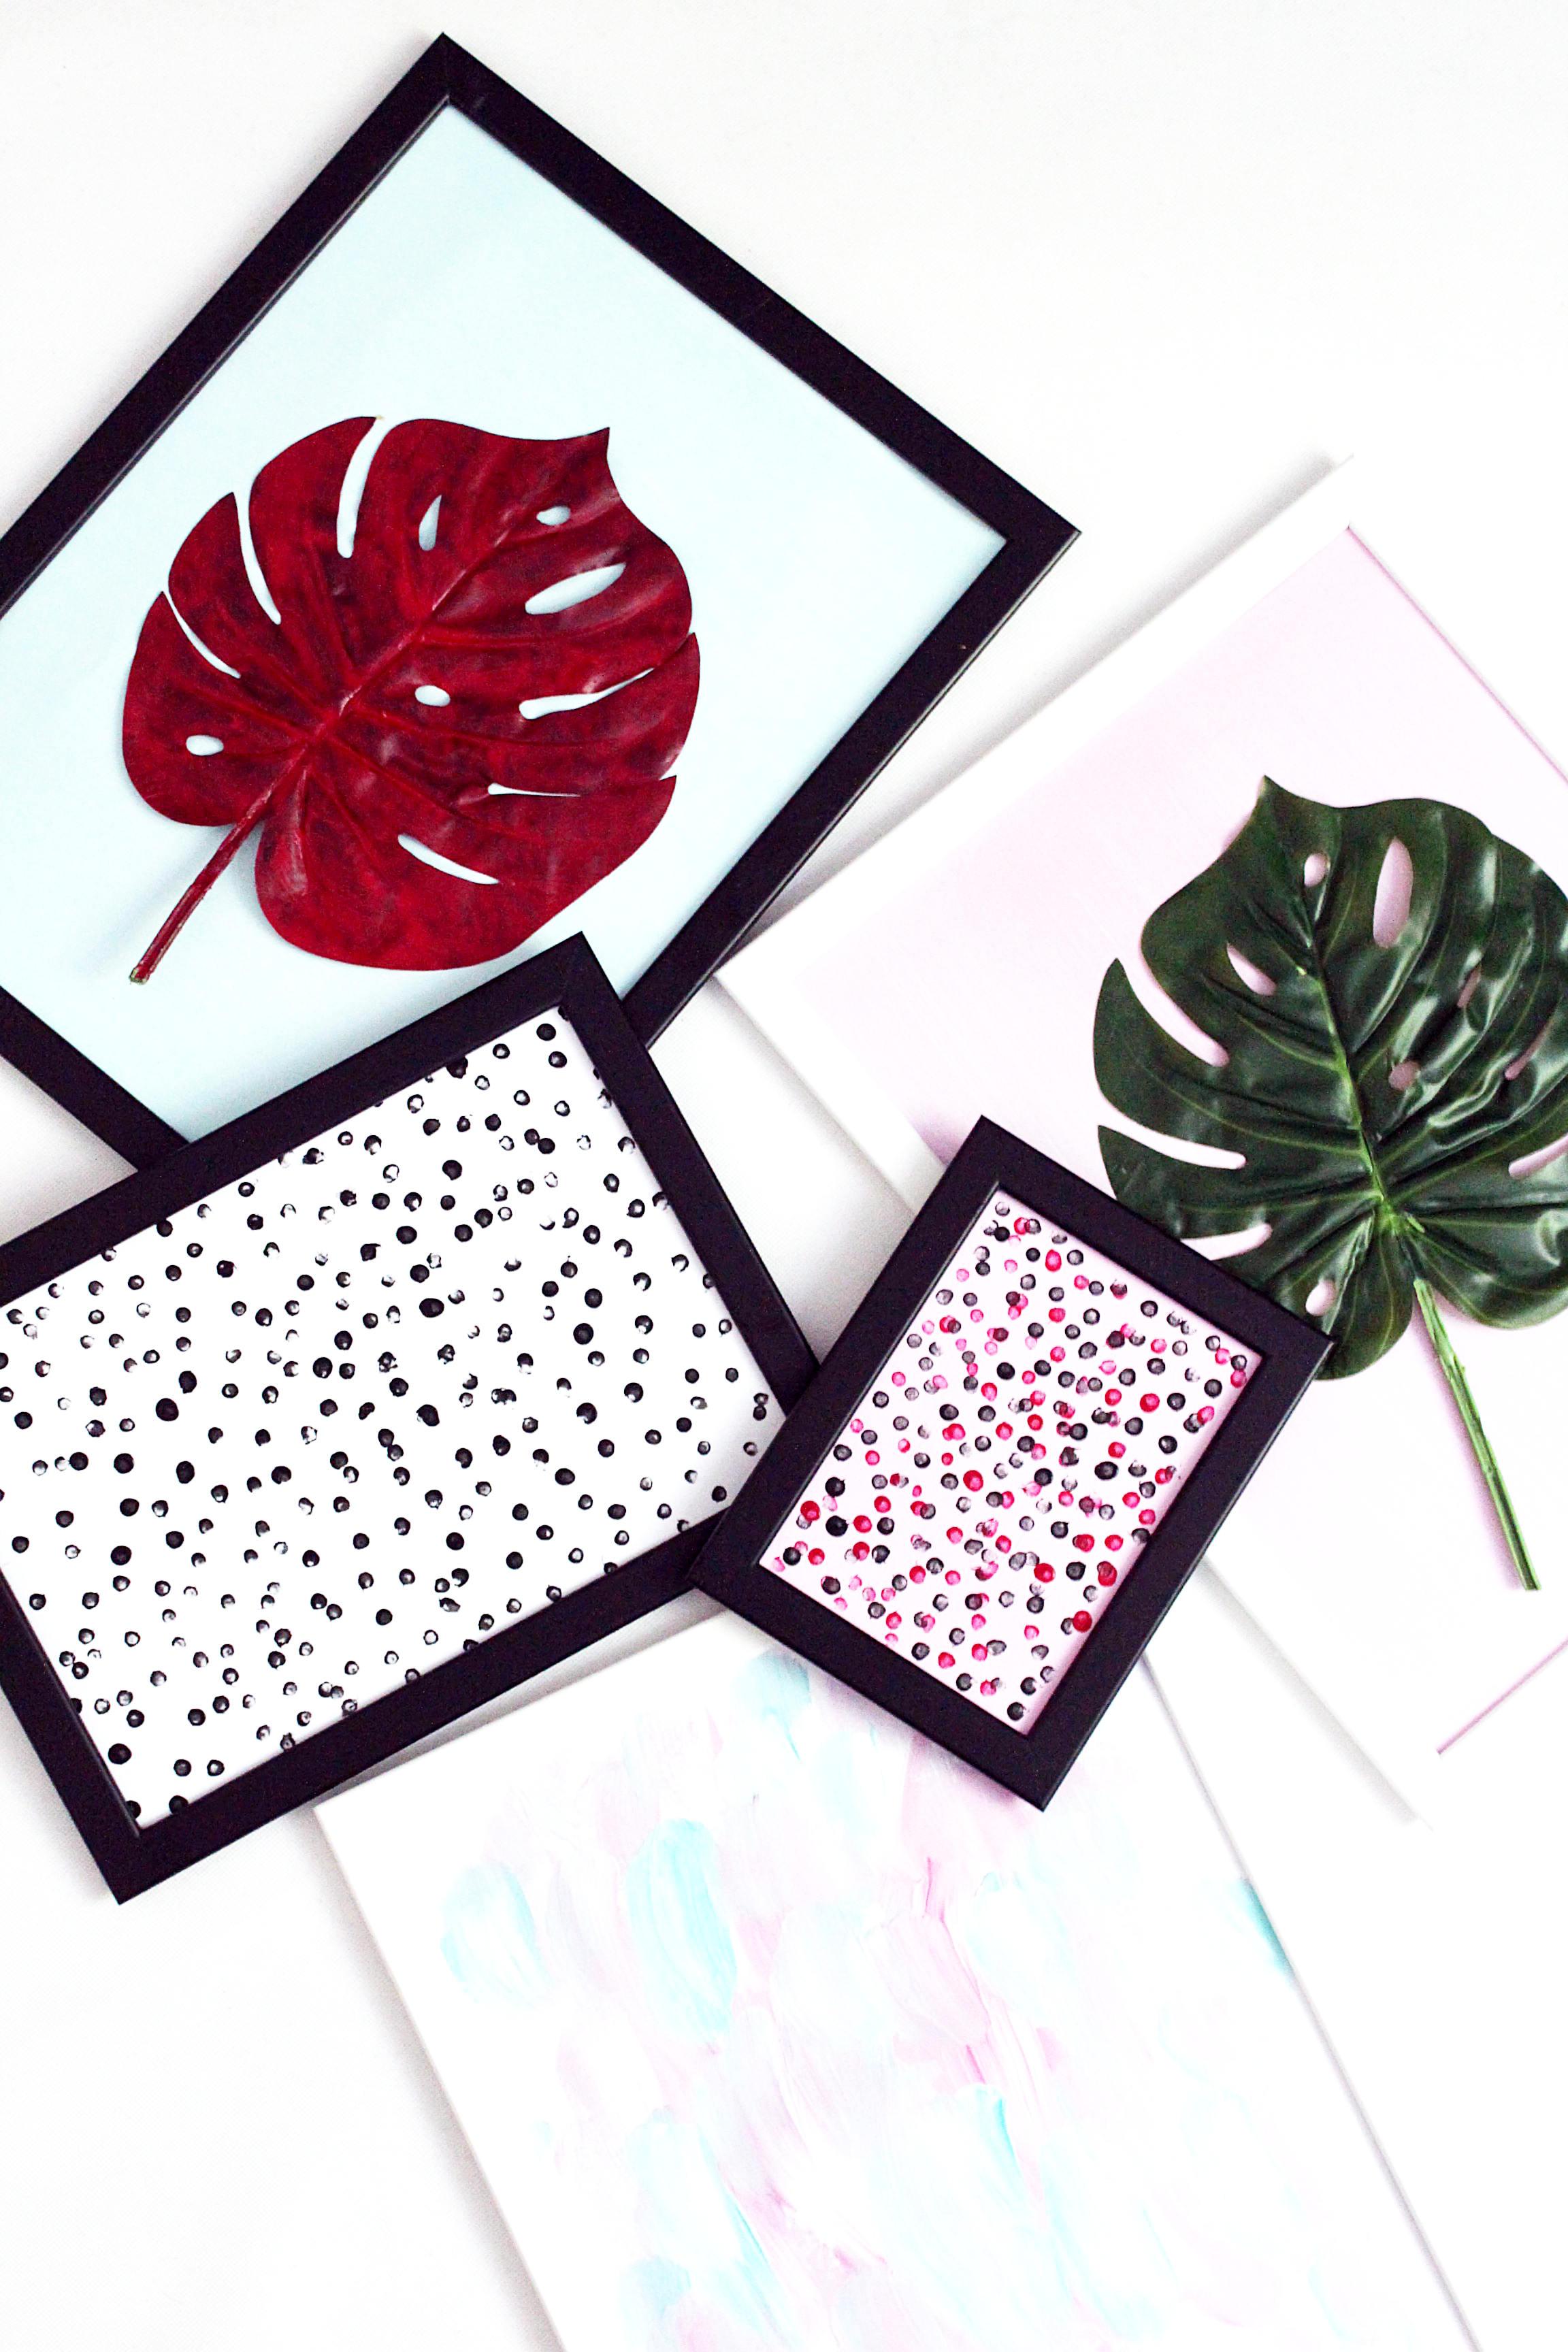 Wanddeko-Ideen